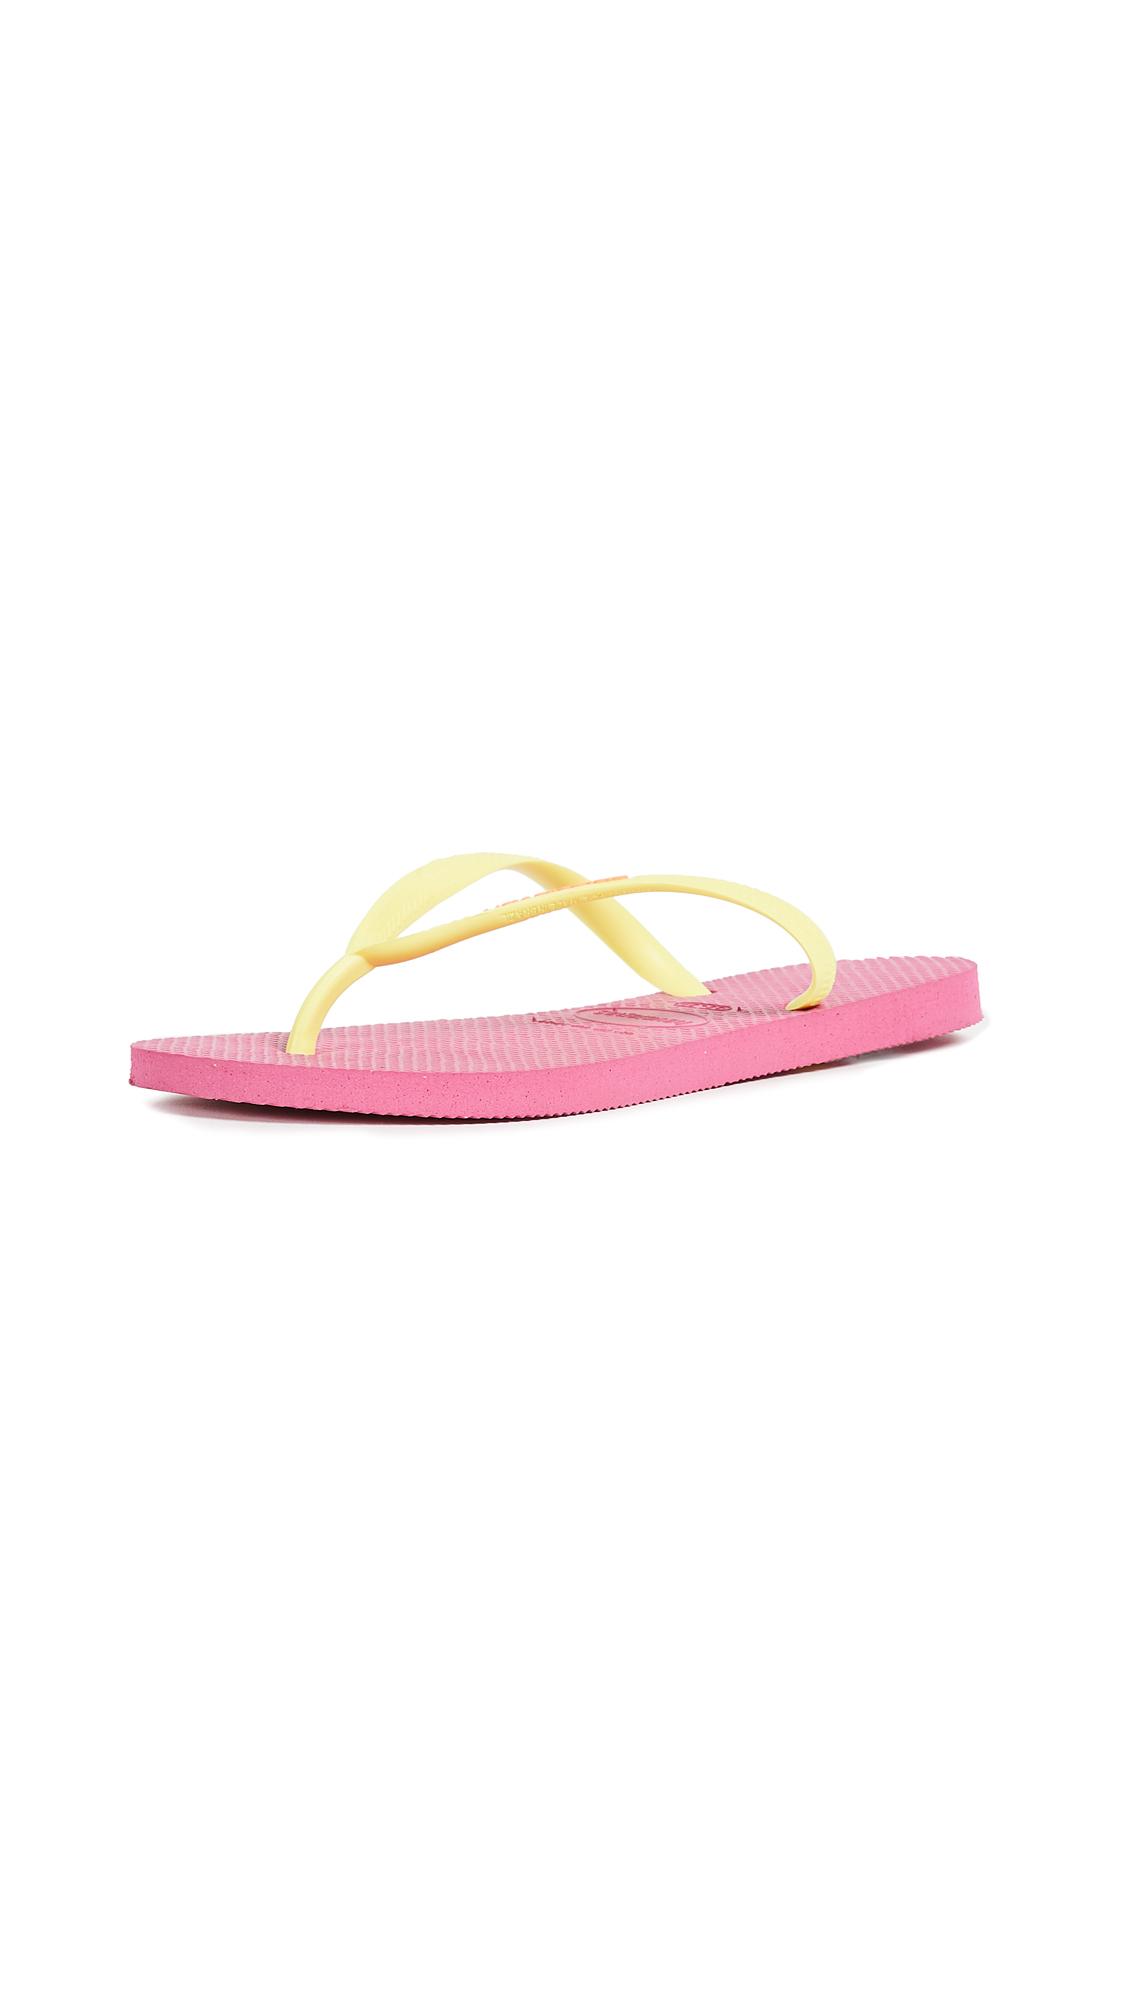 Havaianas Slim Logo Pop Up Flip Flops - Hollywood Rose